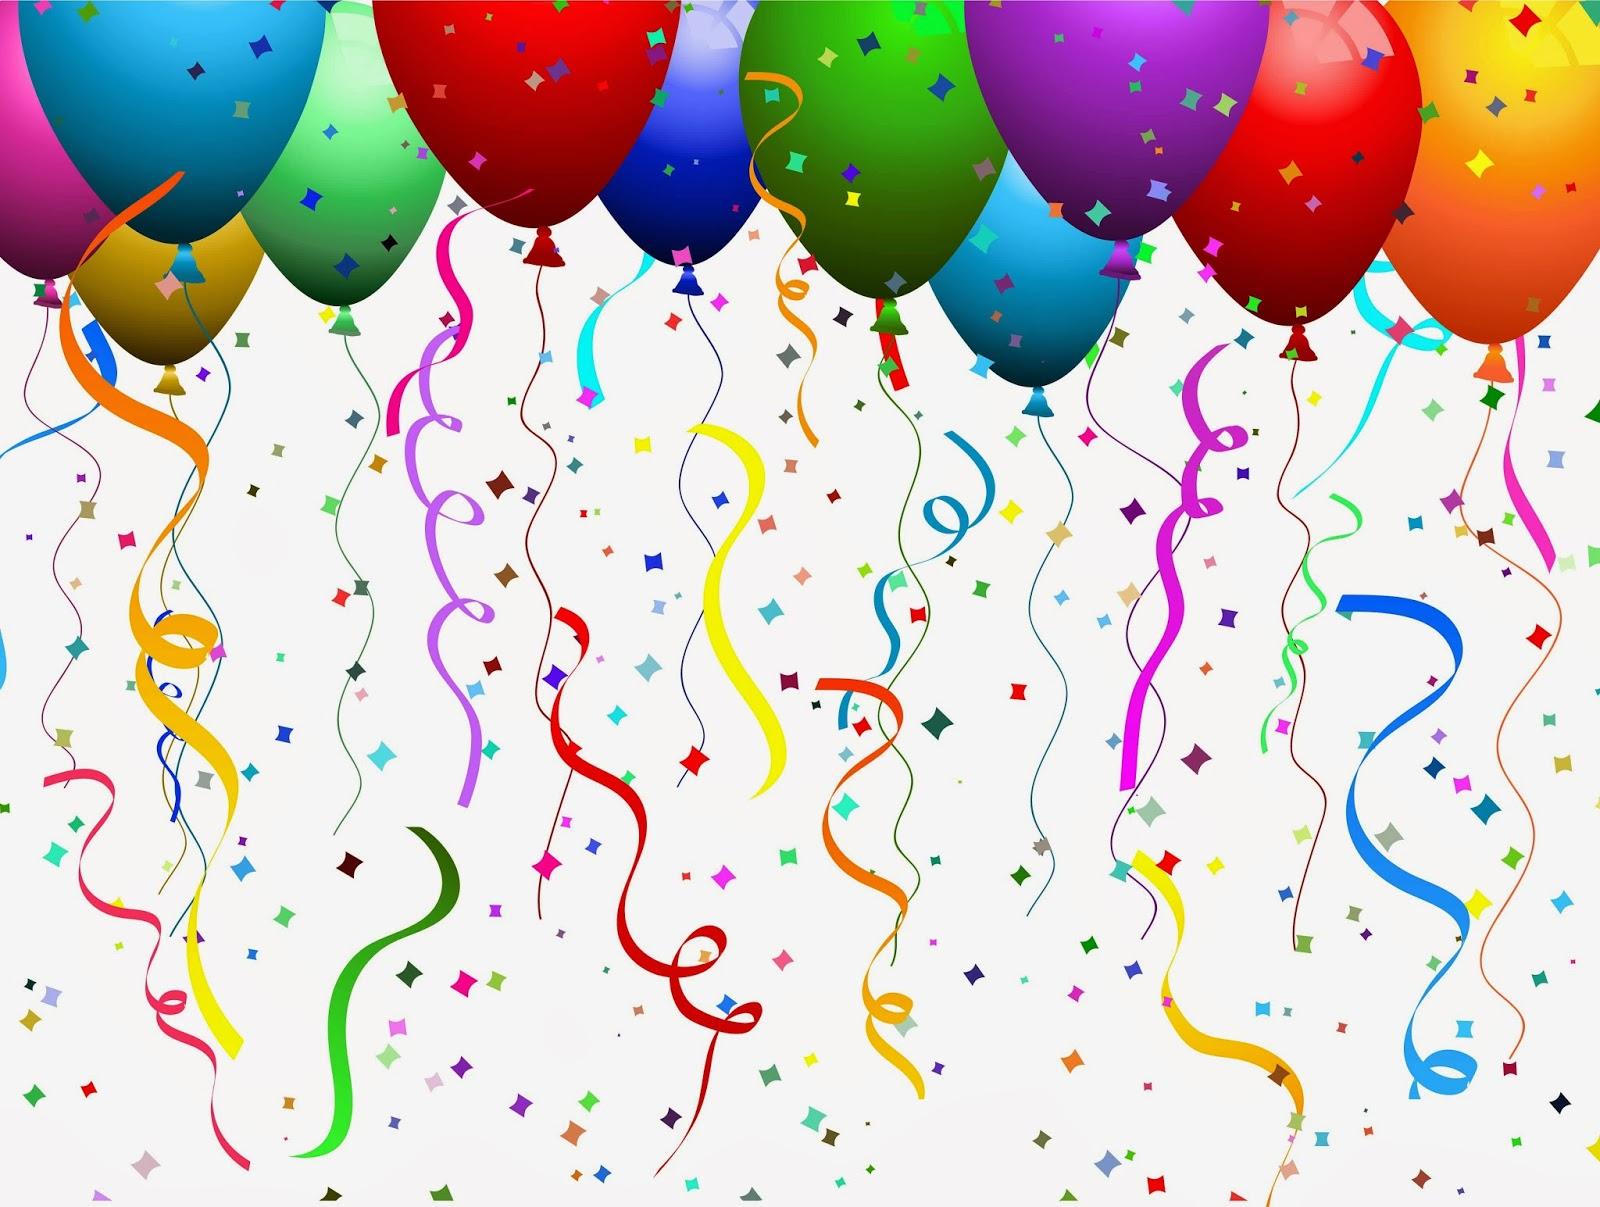 Celebrate clipart balloon. Amazing balloons celebration birthday